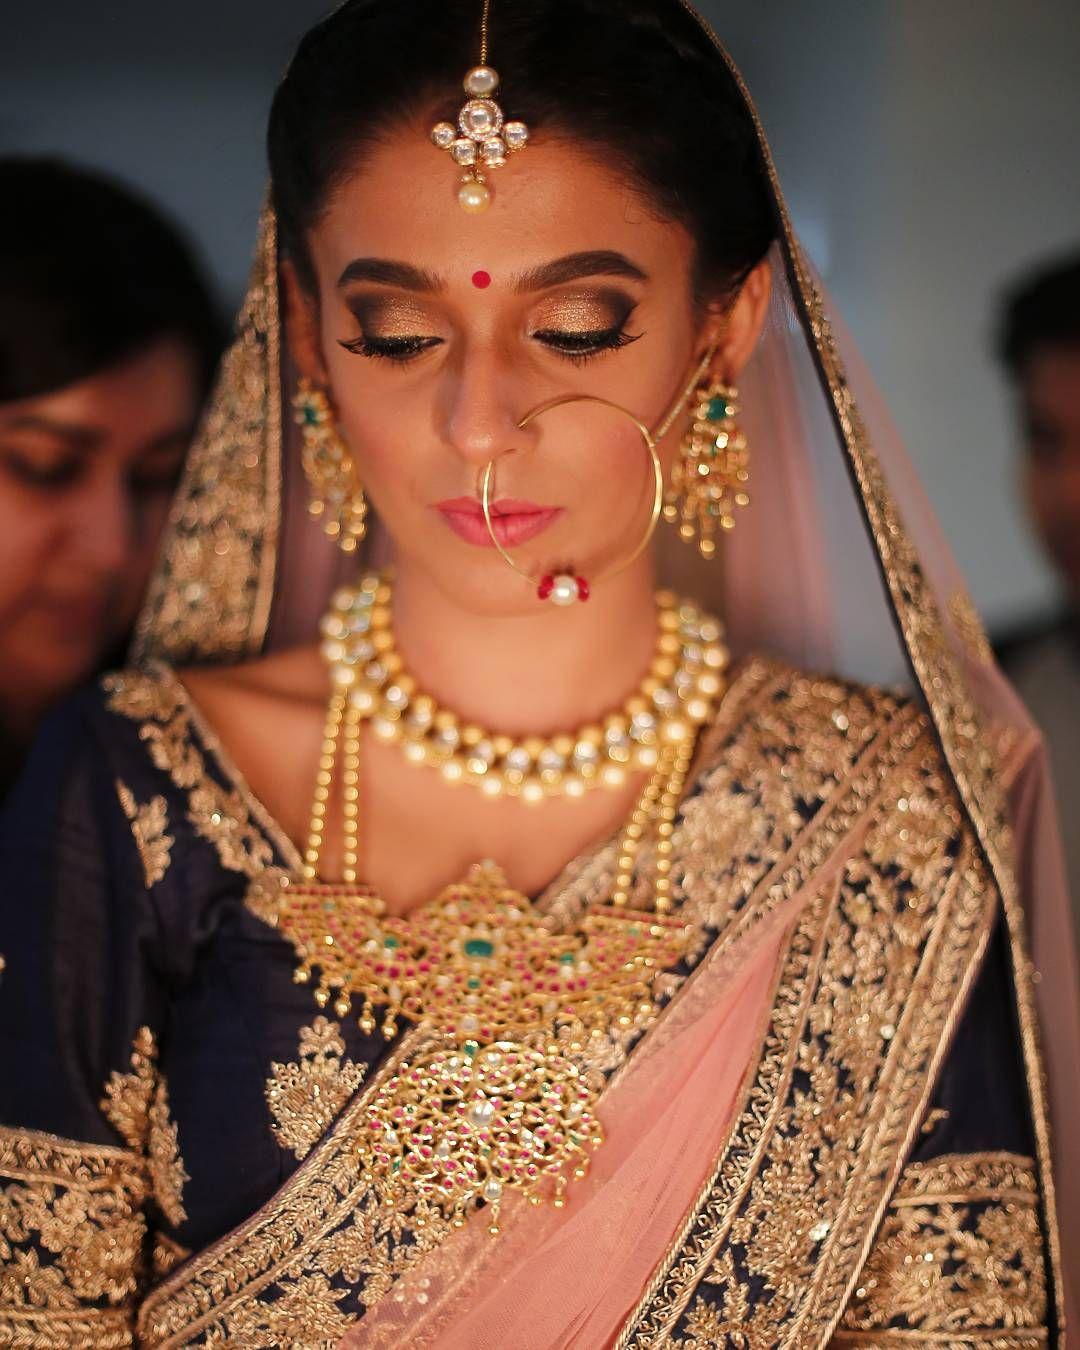 Sakshi Malik Studio Beauty Services in Gurgaon